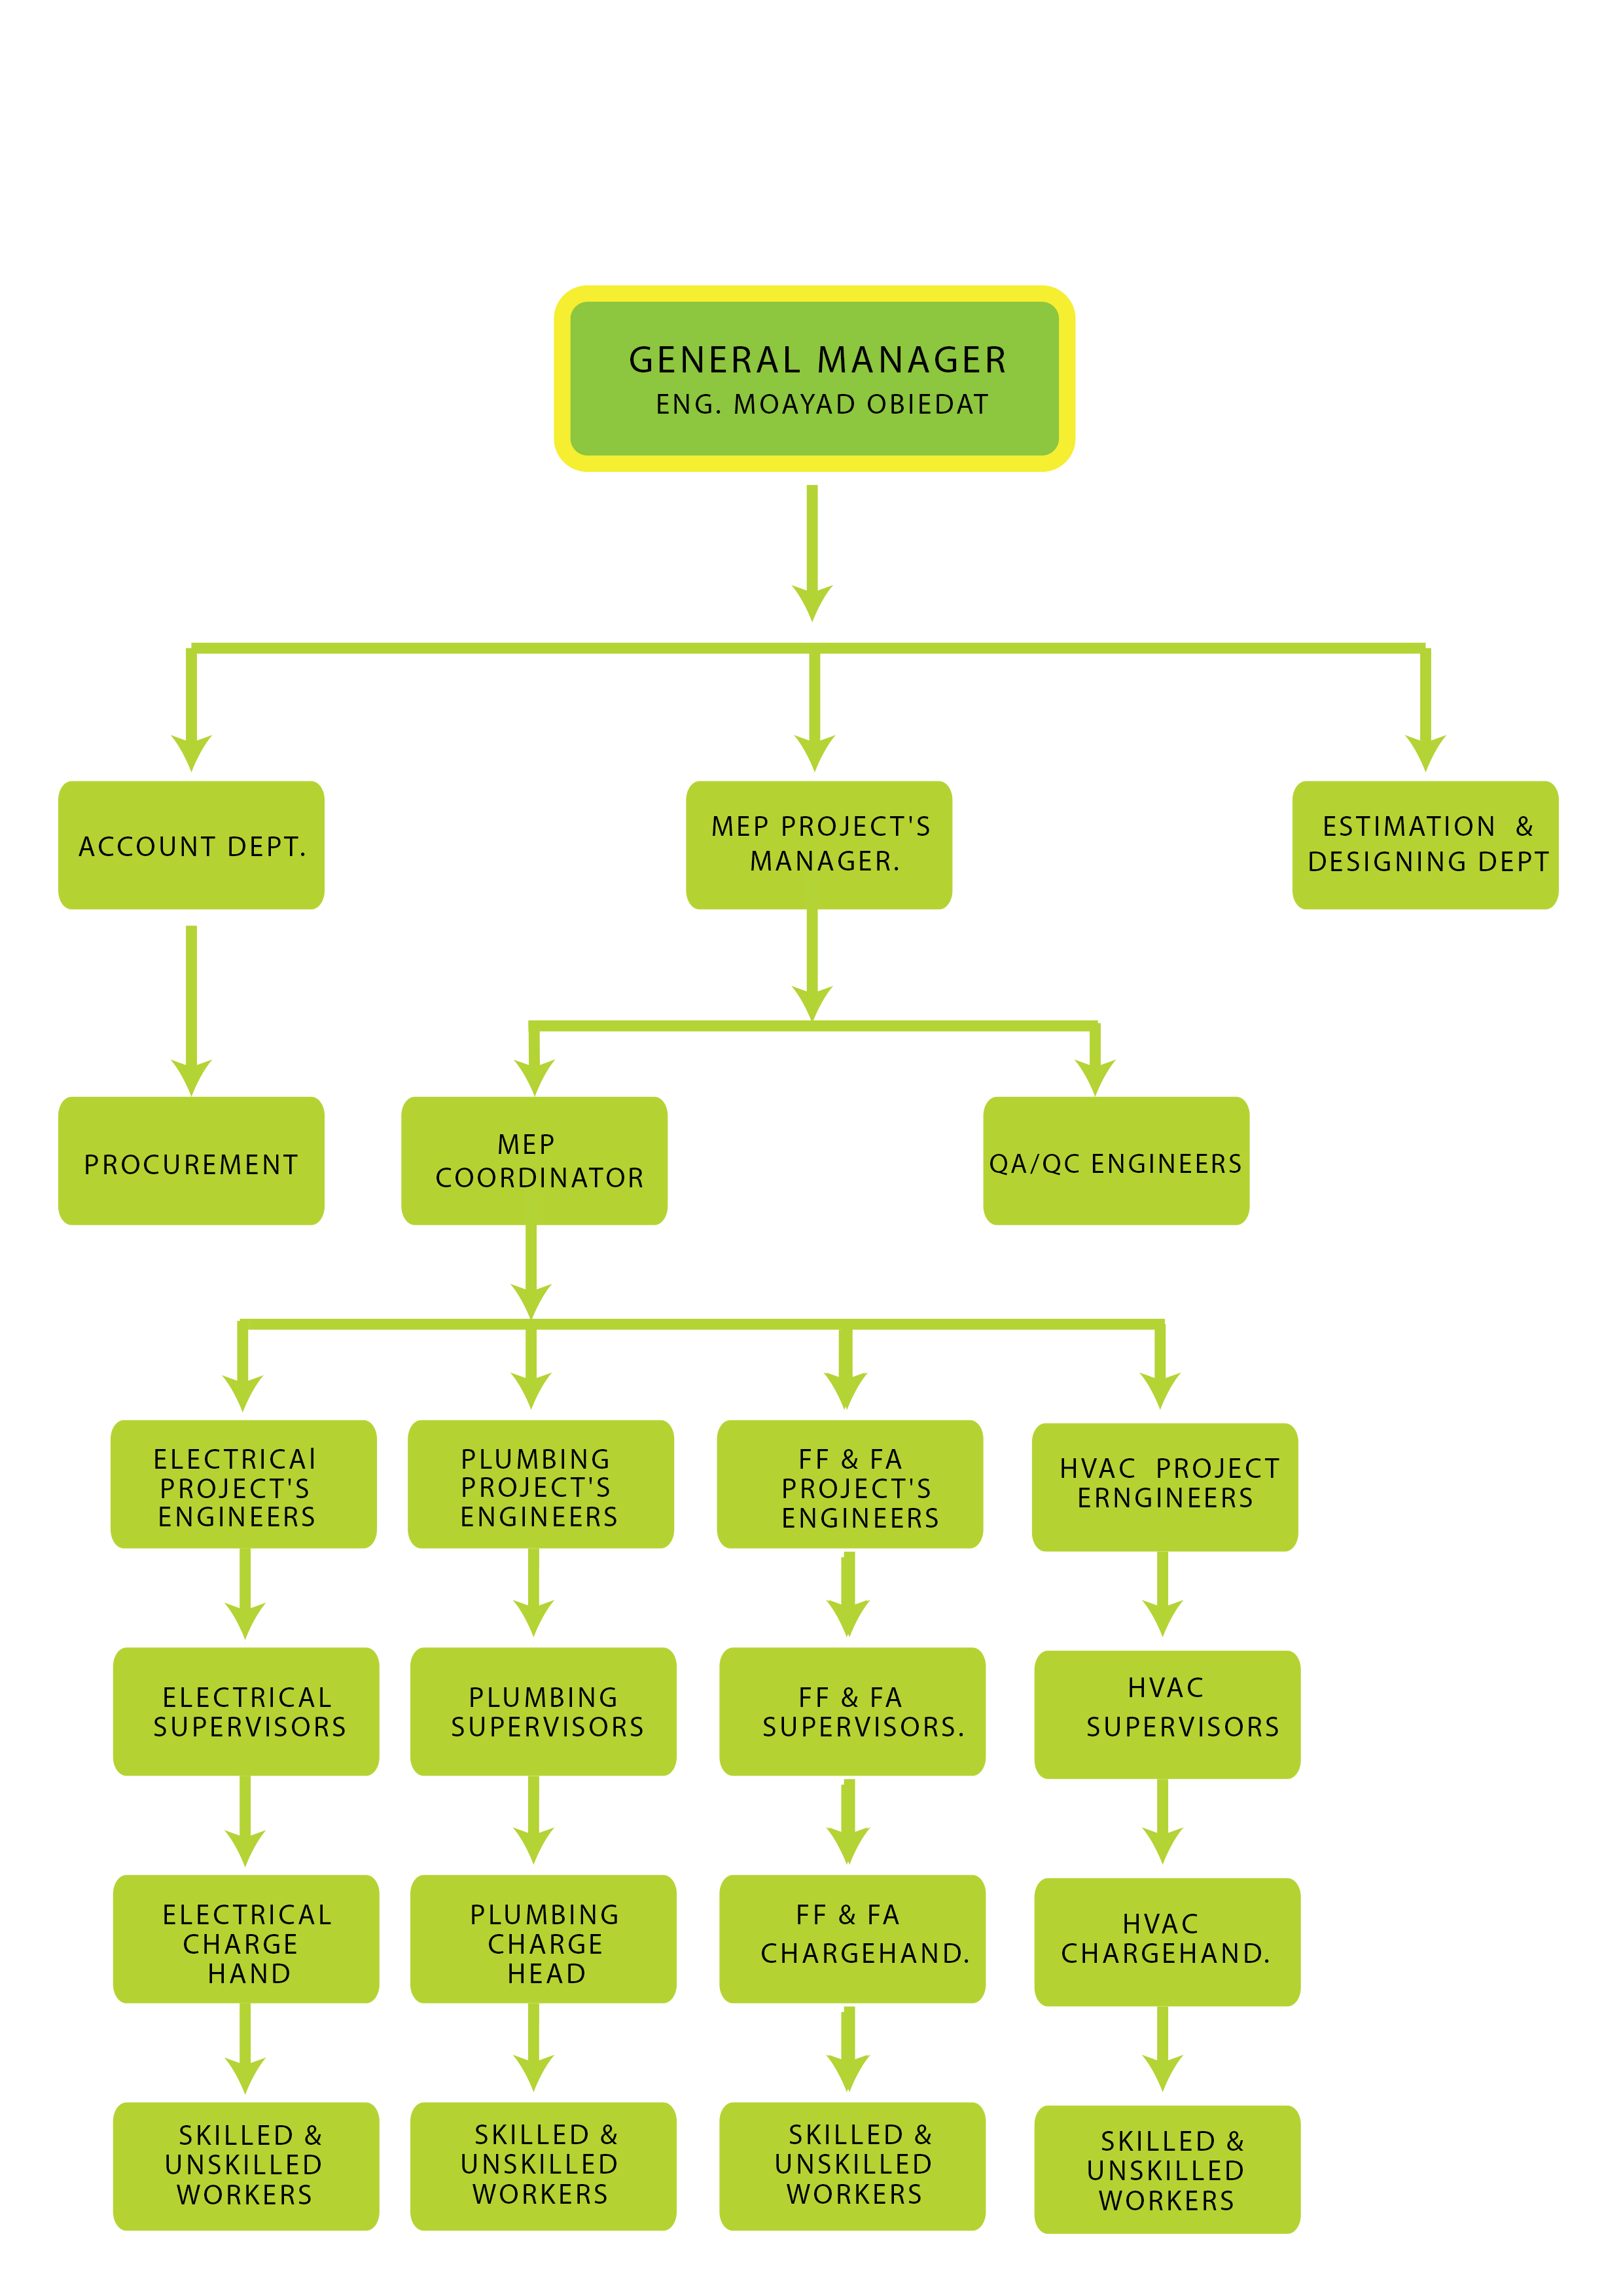 manila hotel organizational structure Information: acacia hotel manila organizational chart  0 comment chain of command, organizational structure, professional partnership, quality standards,.